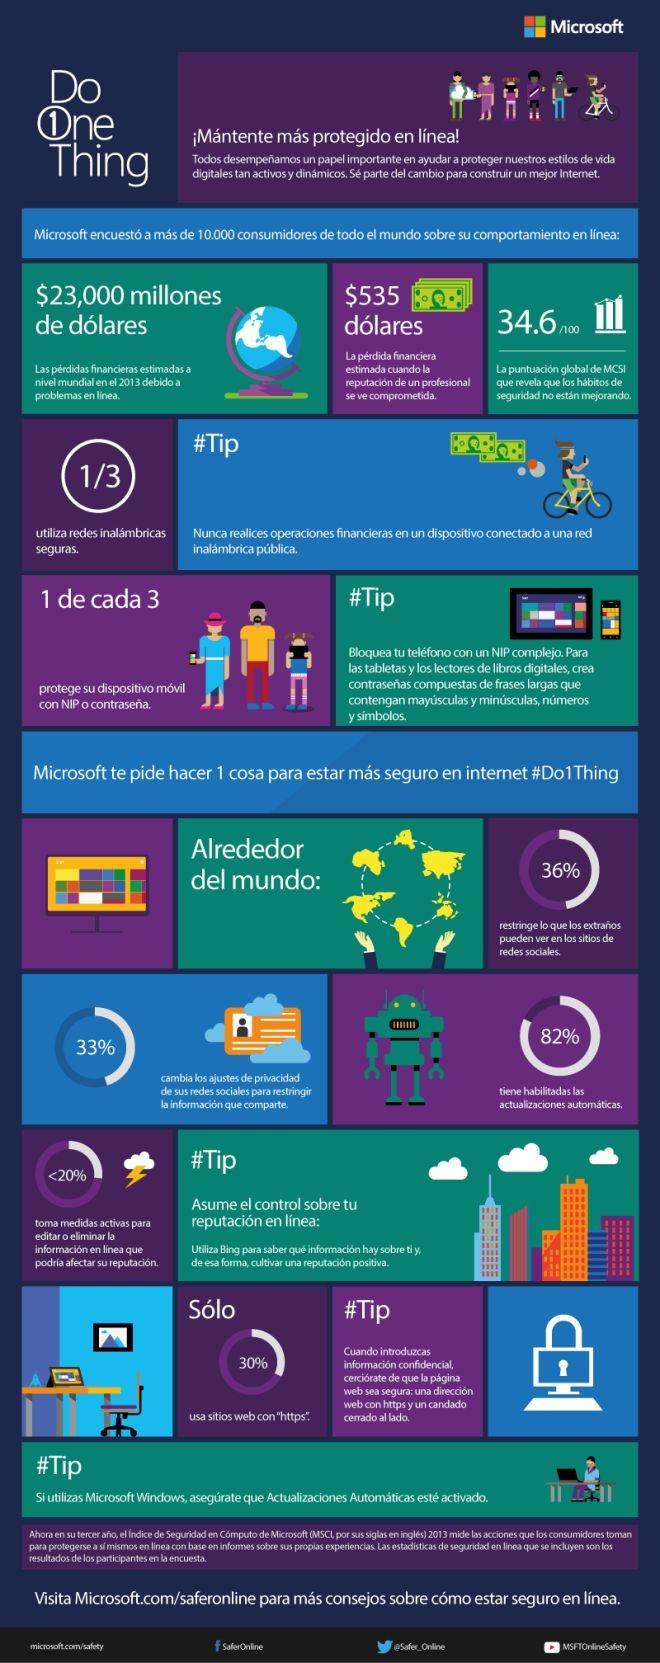 Consejos de seguridad para Internet Vía: @Safer_Online #infografia #infographic